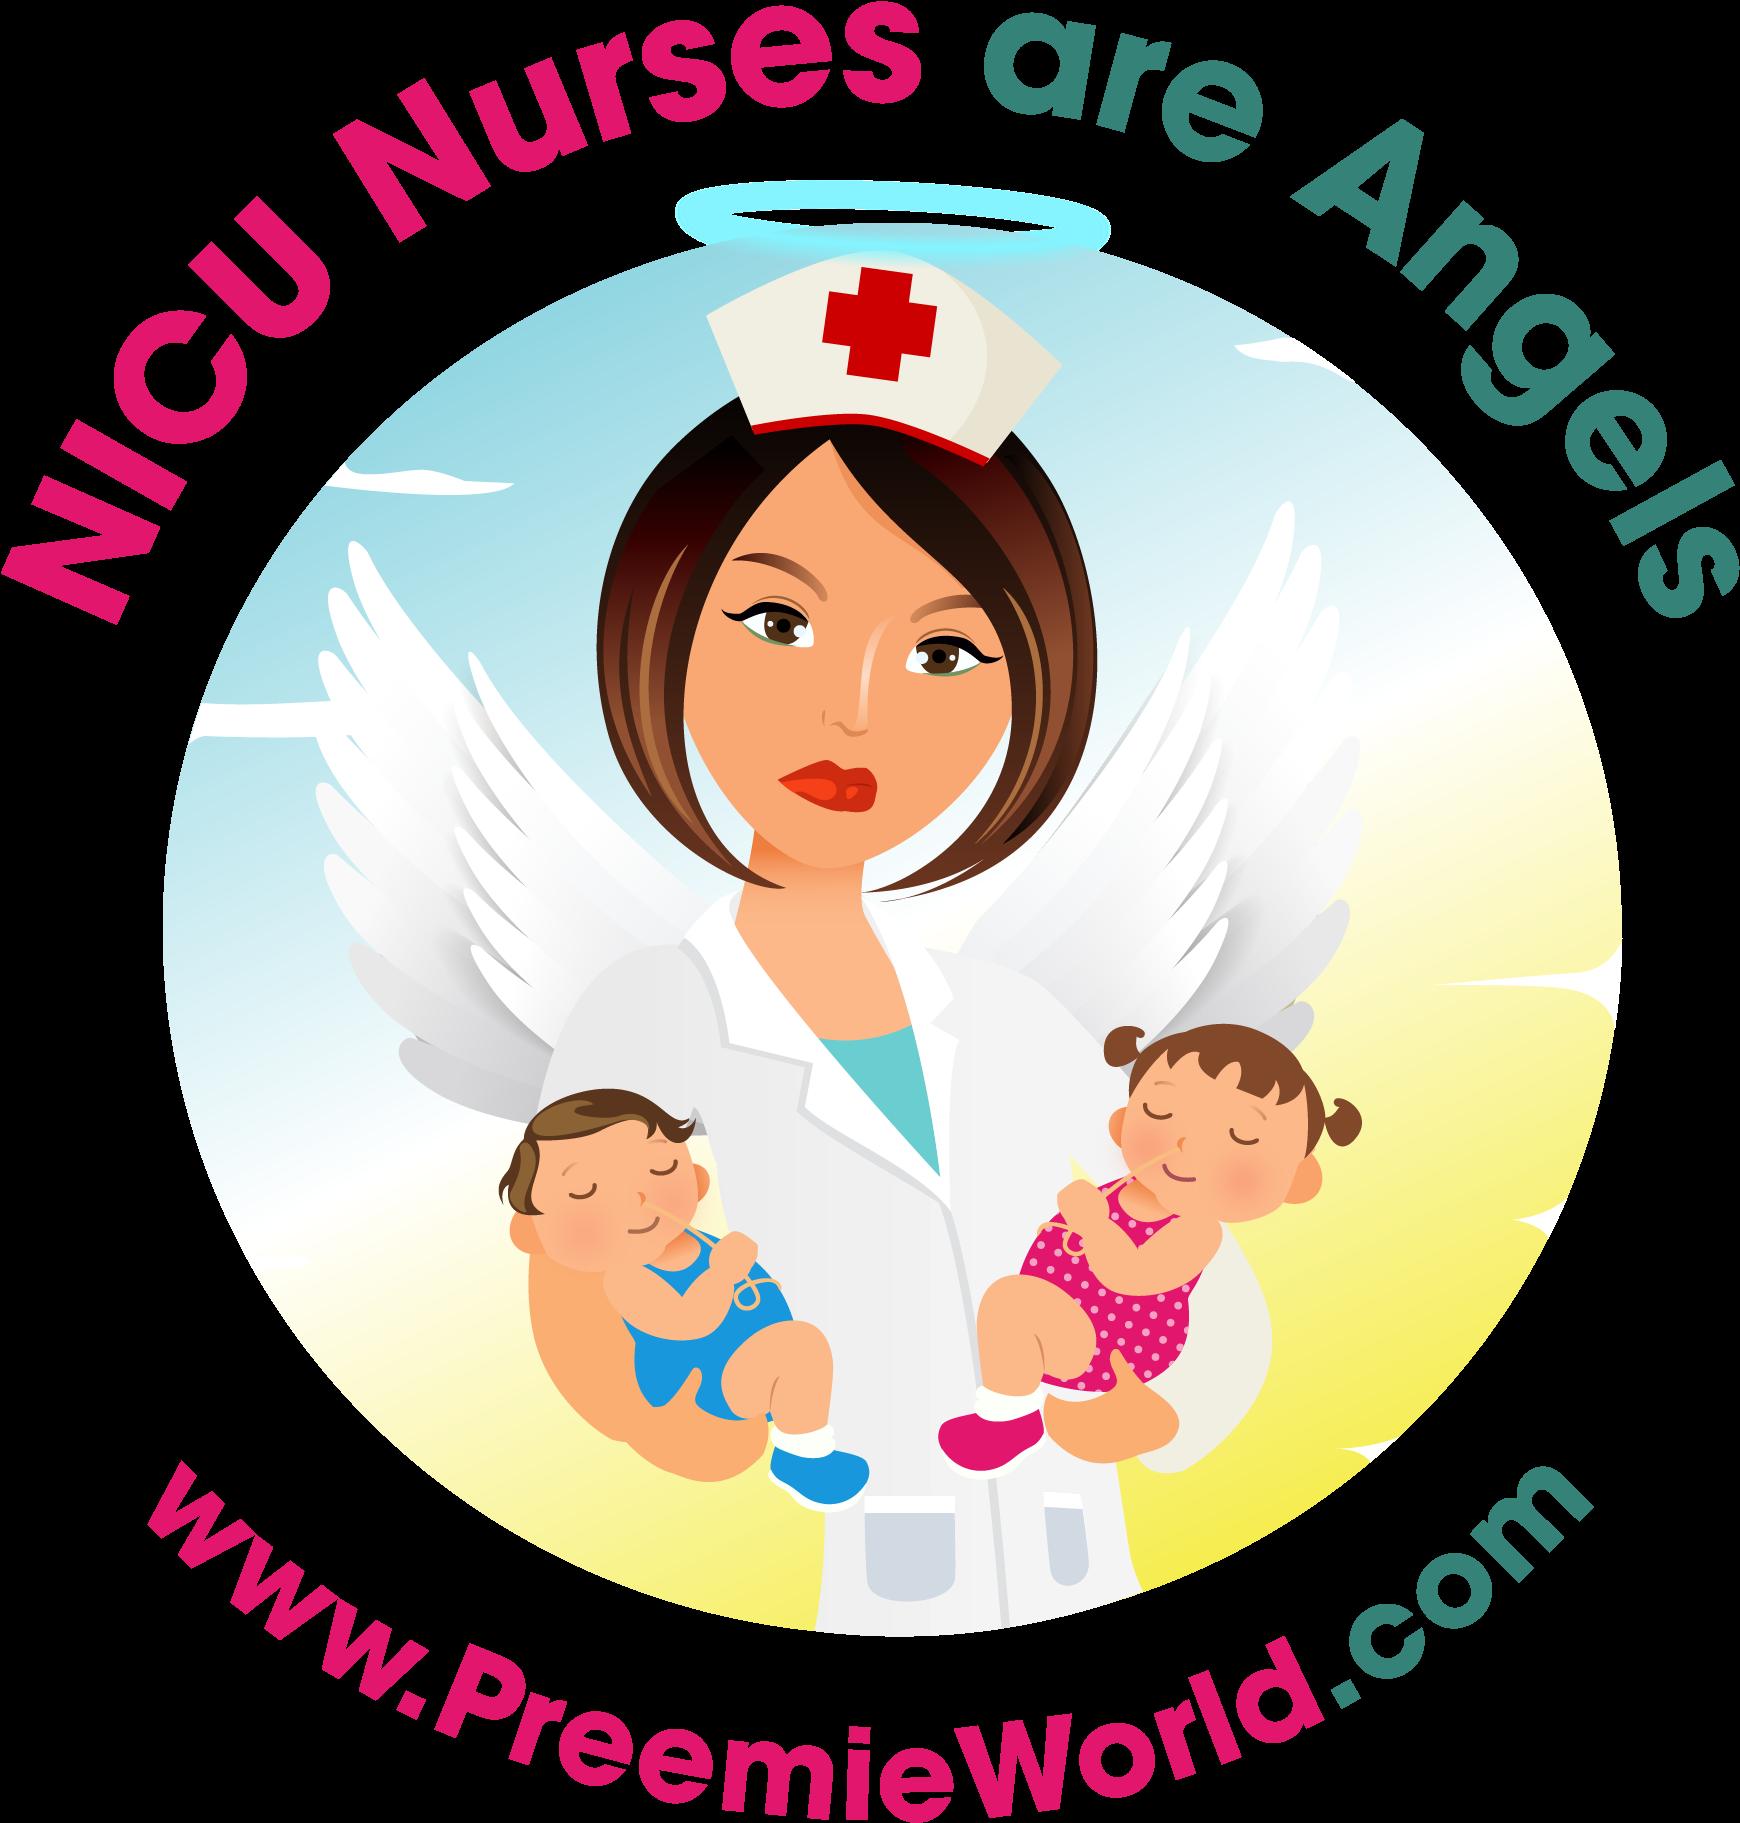 Nicu Nurses Are A Blessing.